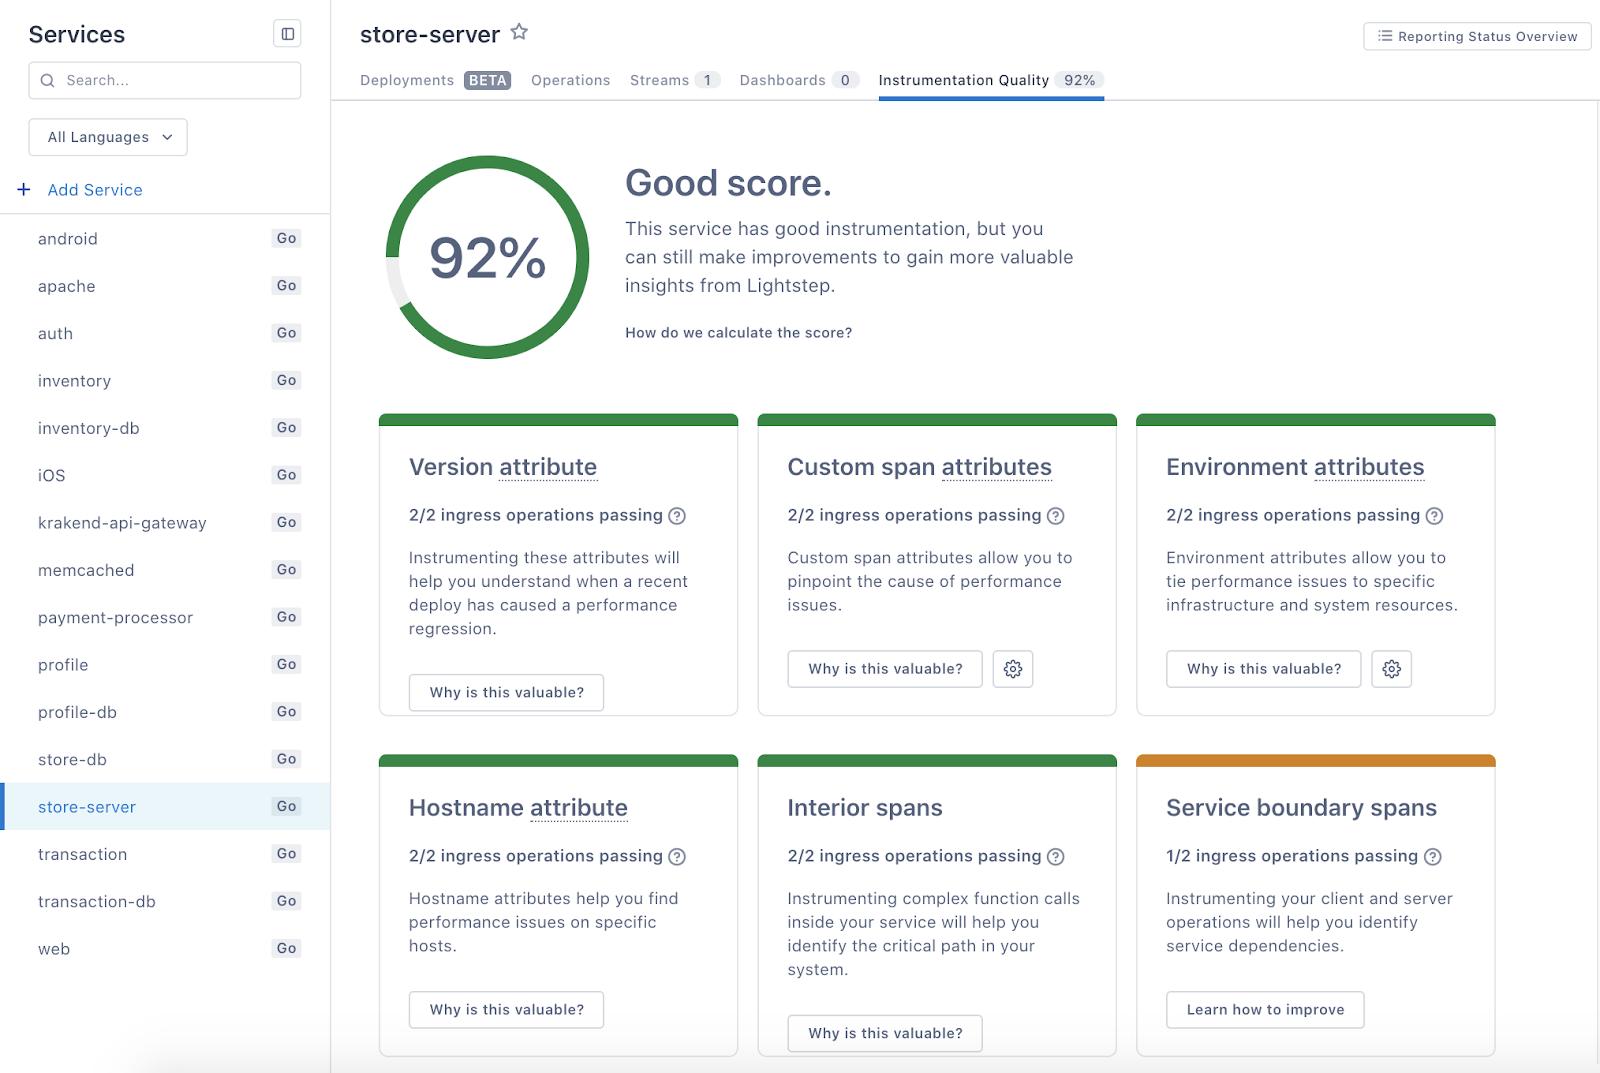 Instrumentation Quality Score - 92%